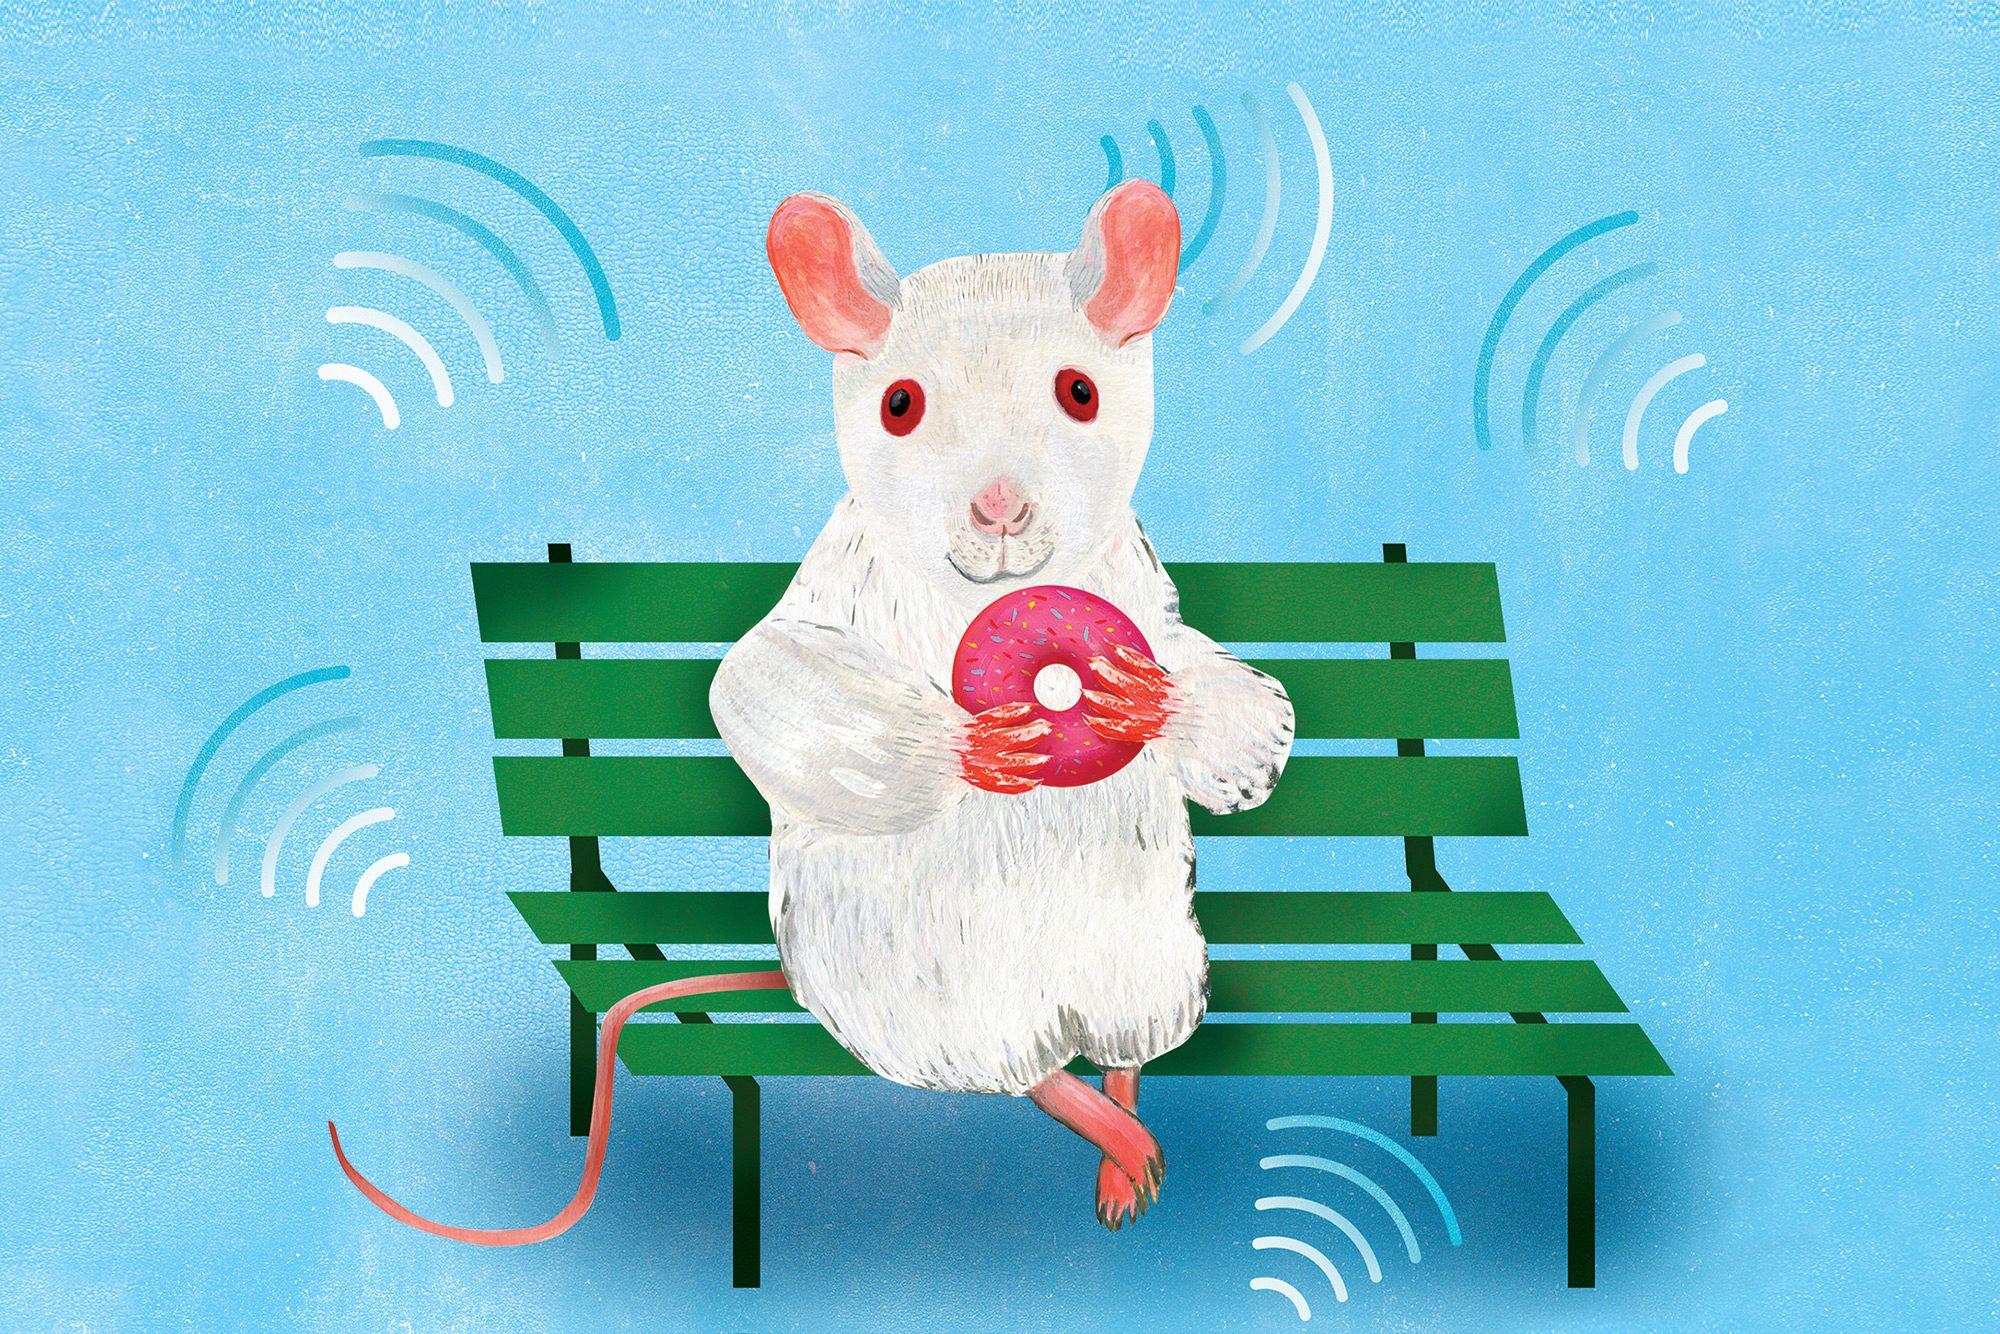 Bench mouse illustration